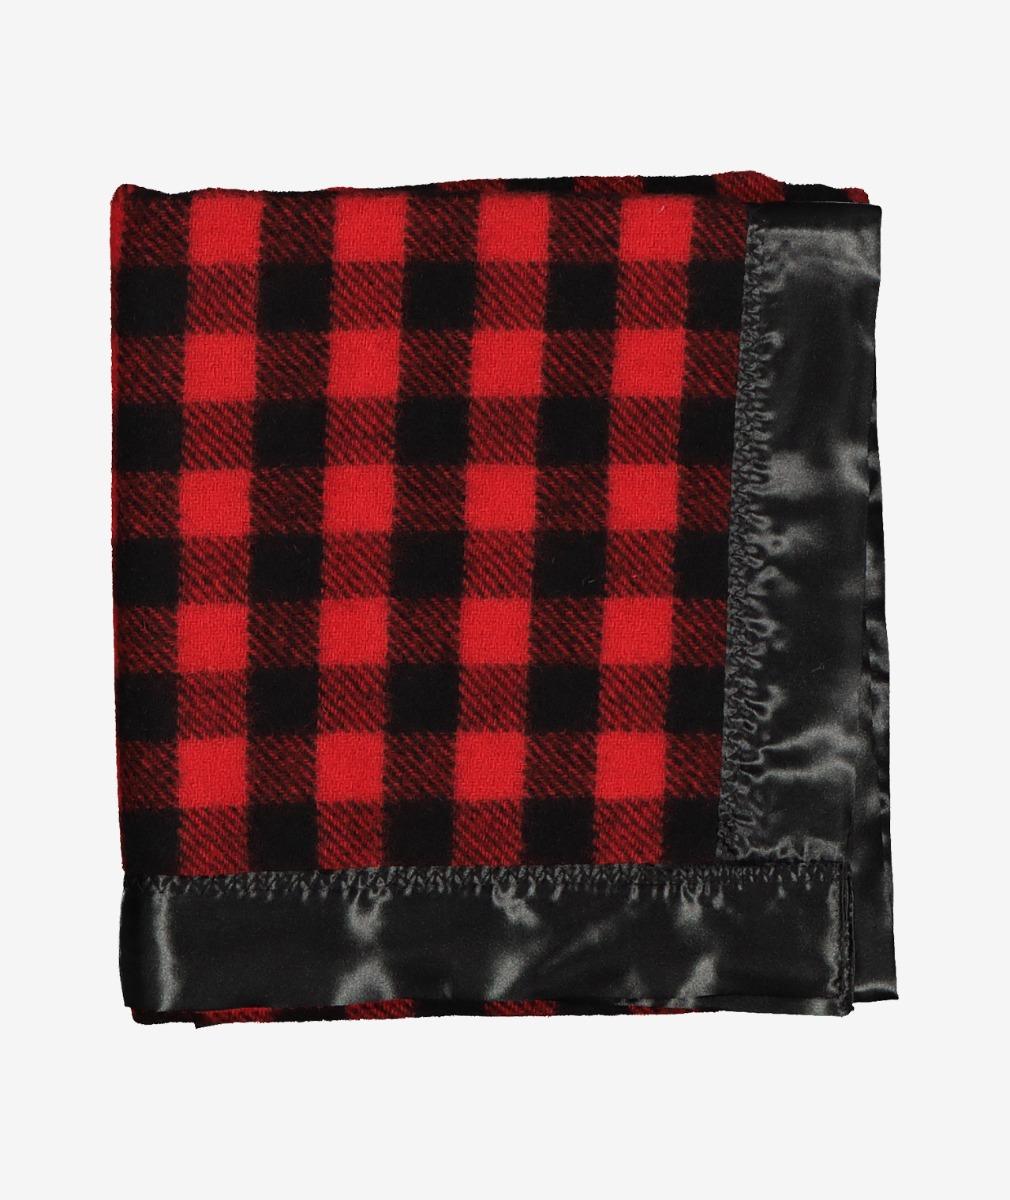 Swanndri Baby Buggy Wool Blanket in Red/Black Check